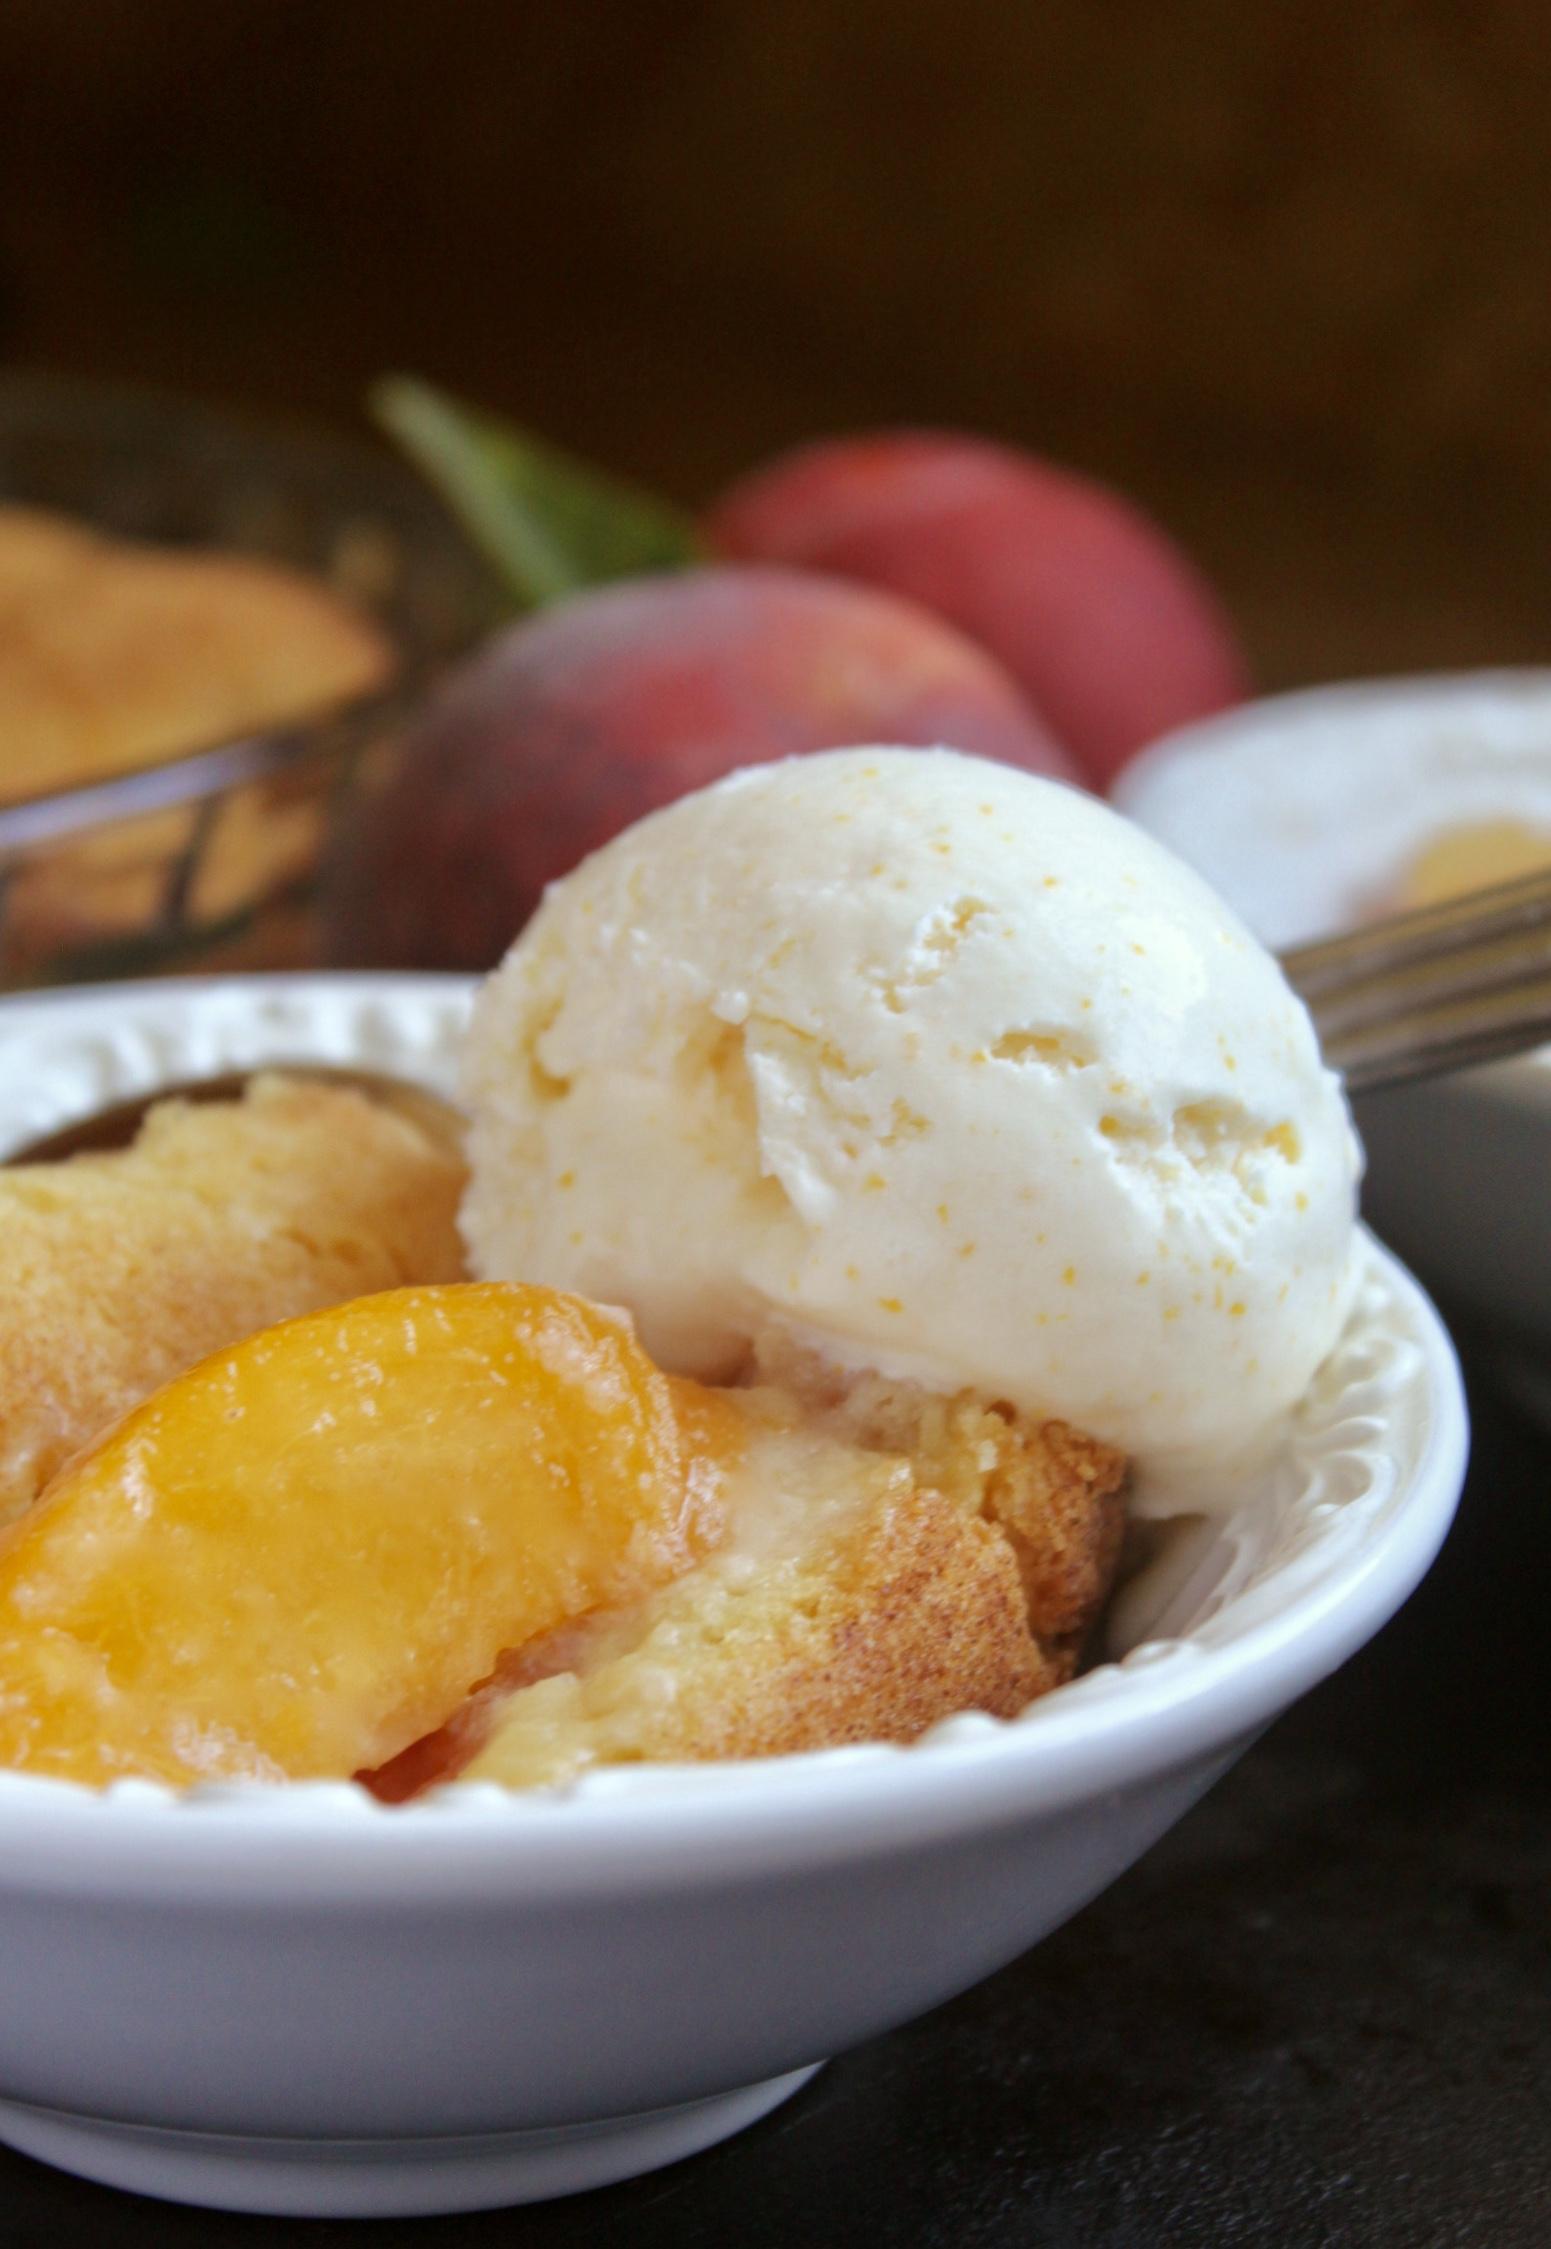 Peach cobbler with lemon ice cream